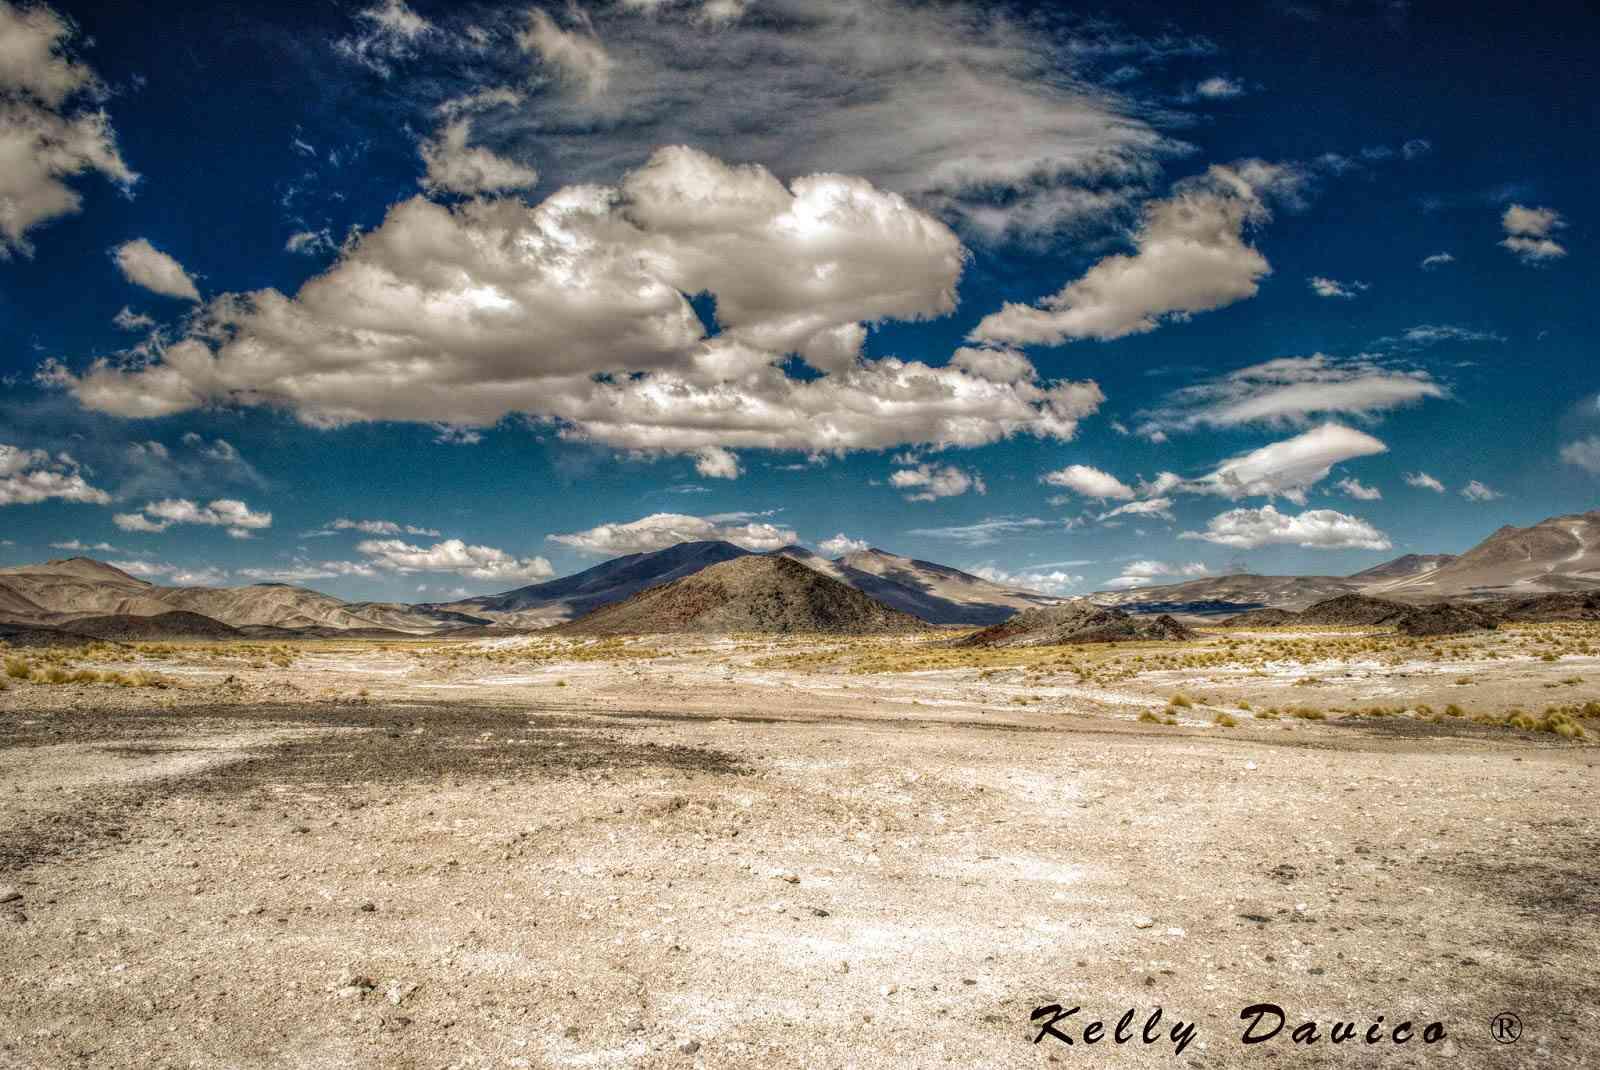 Kelly Davico | Santa Fe Argentina | 360 3D VR tours